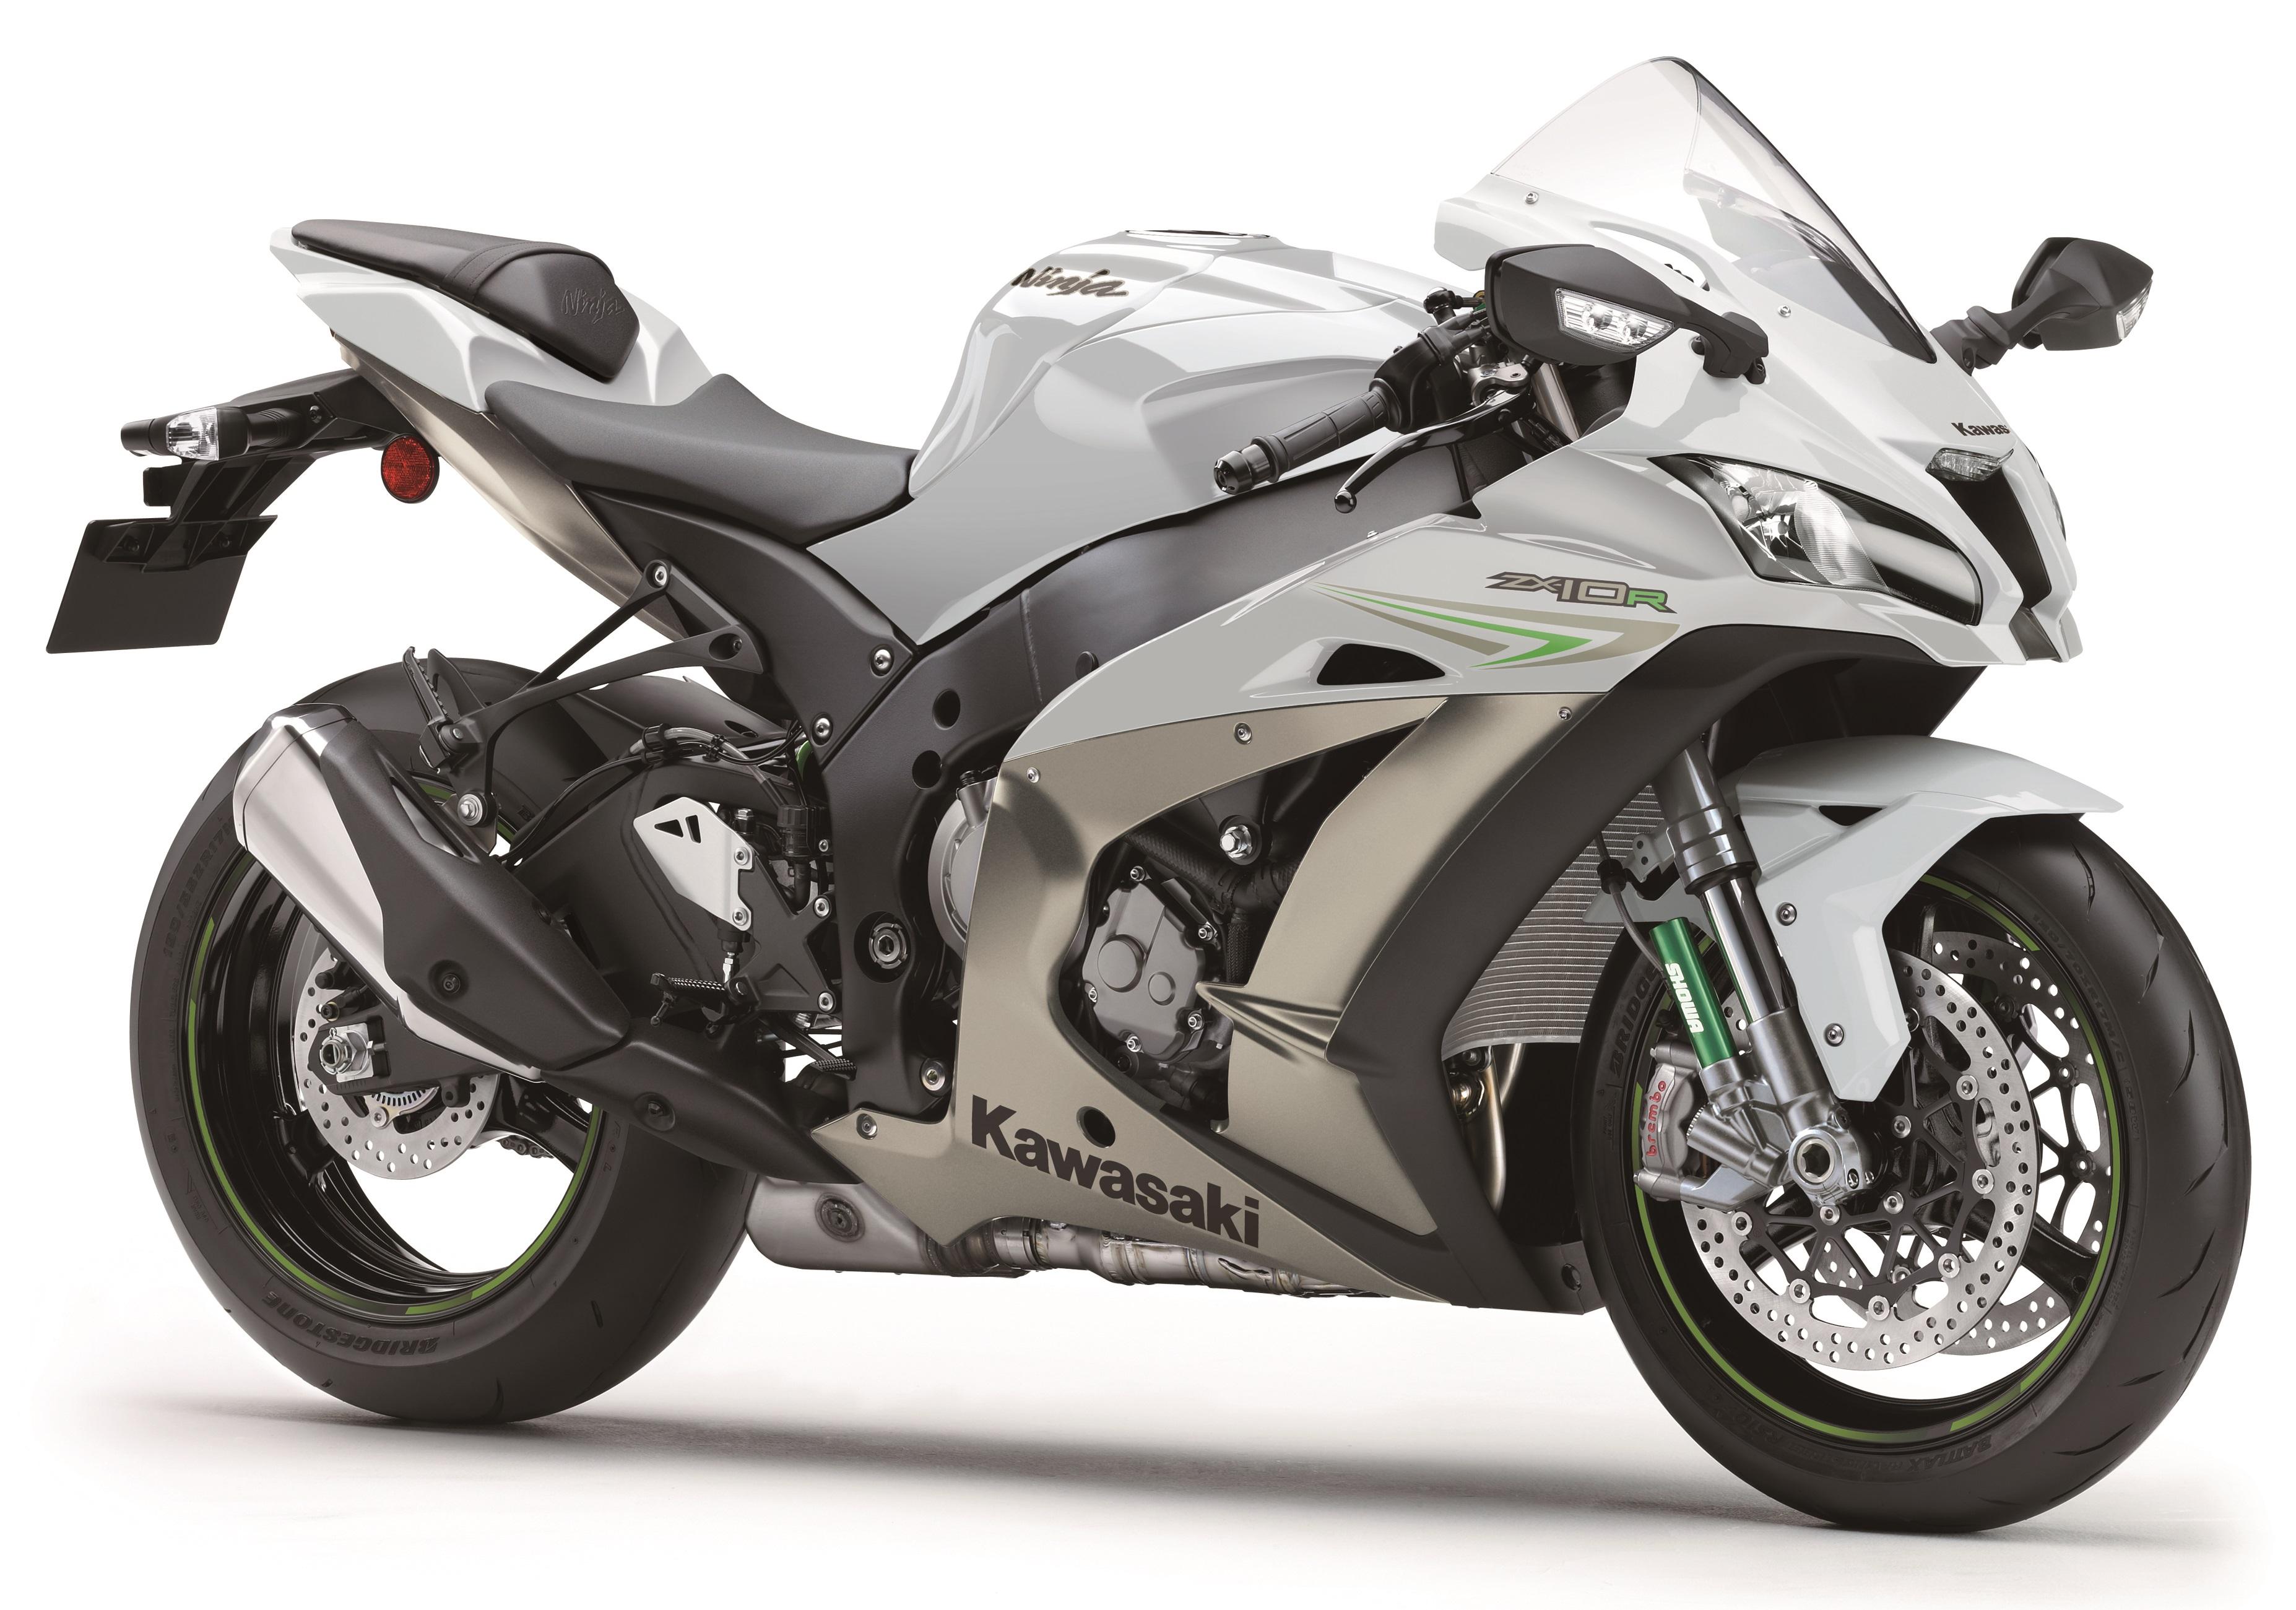 Kawasaki Ninja ZX-10R • Review • For Sale • Price Guide • The Bike ...